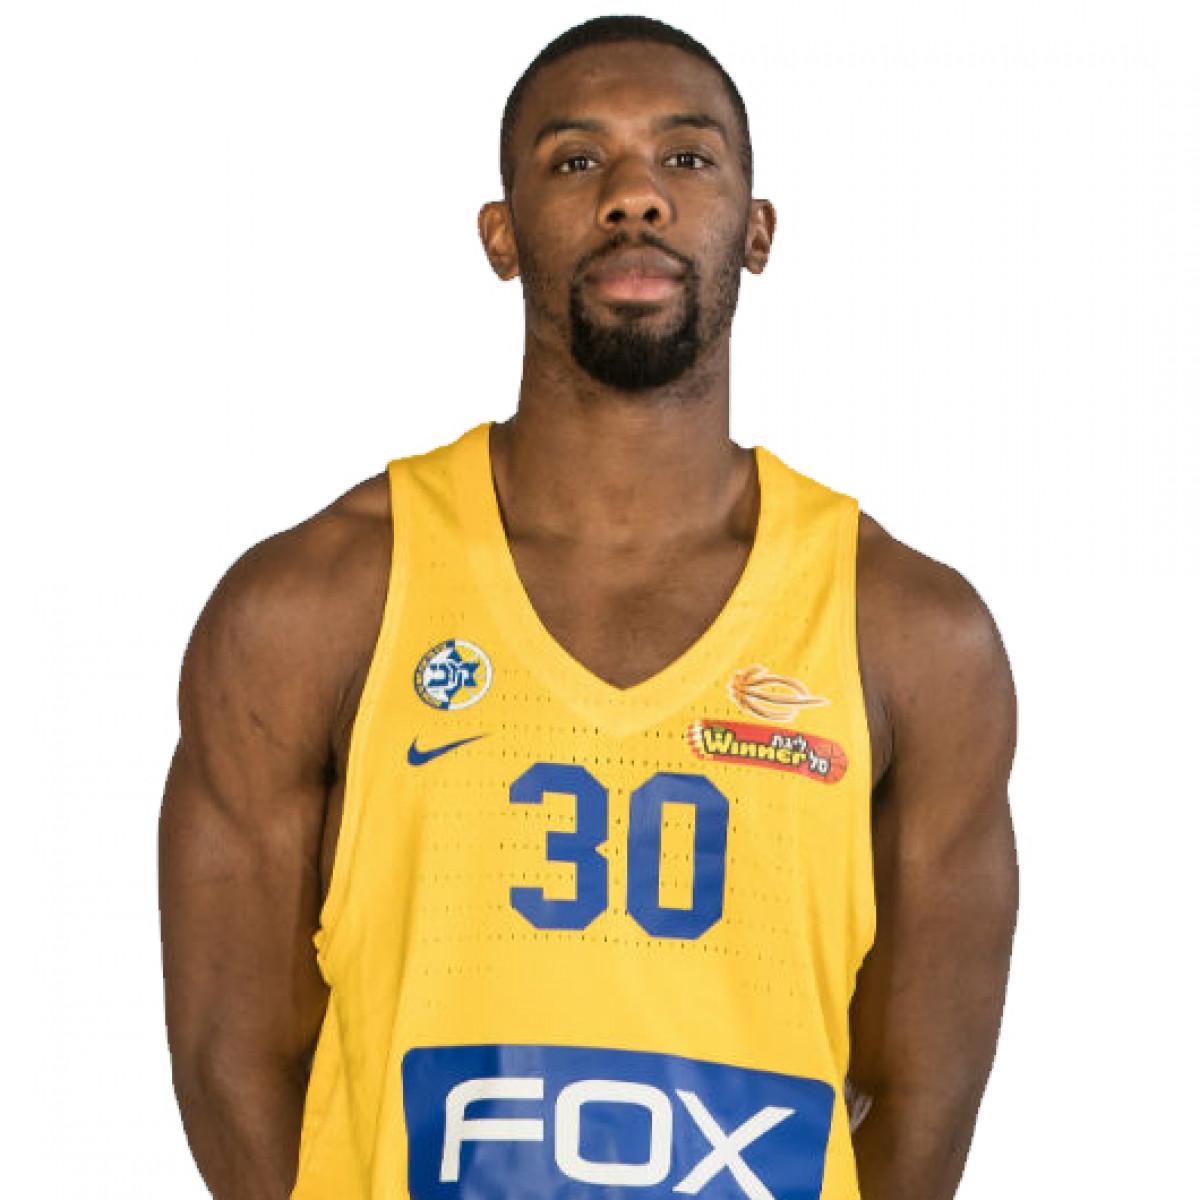 Photo of Norris Cole, 2017-2018 season